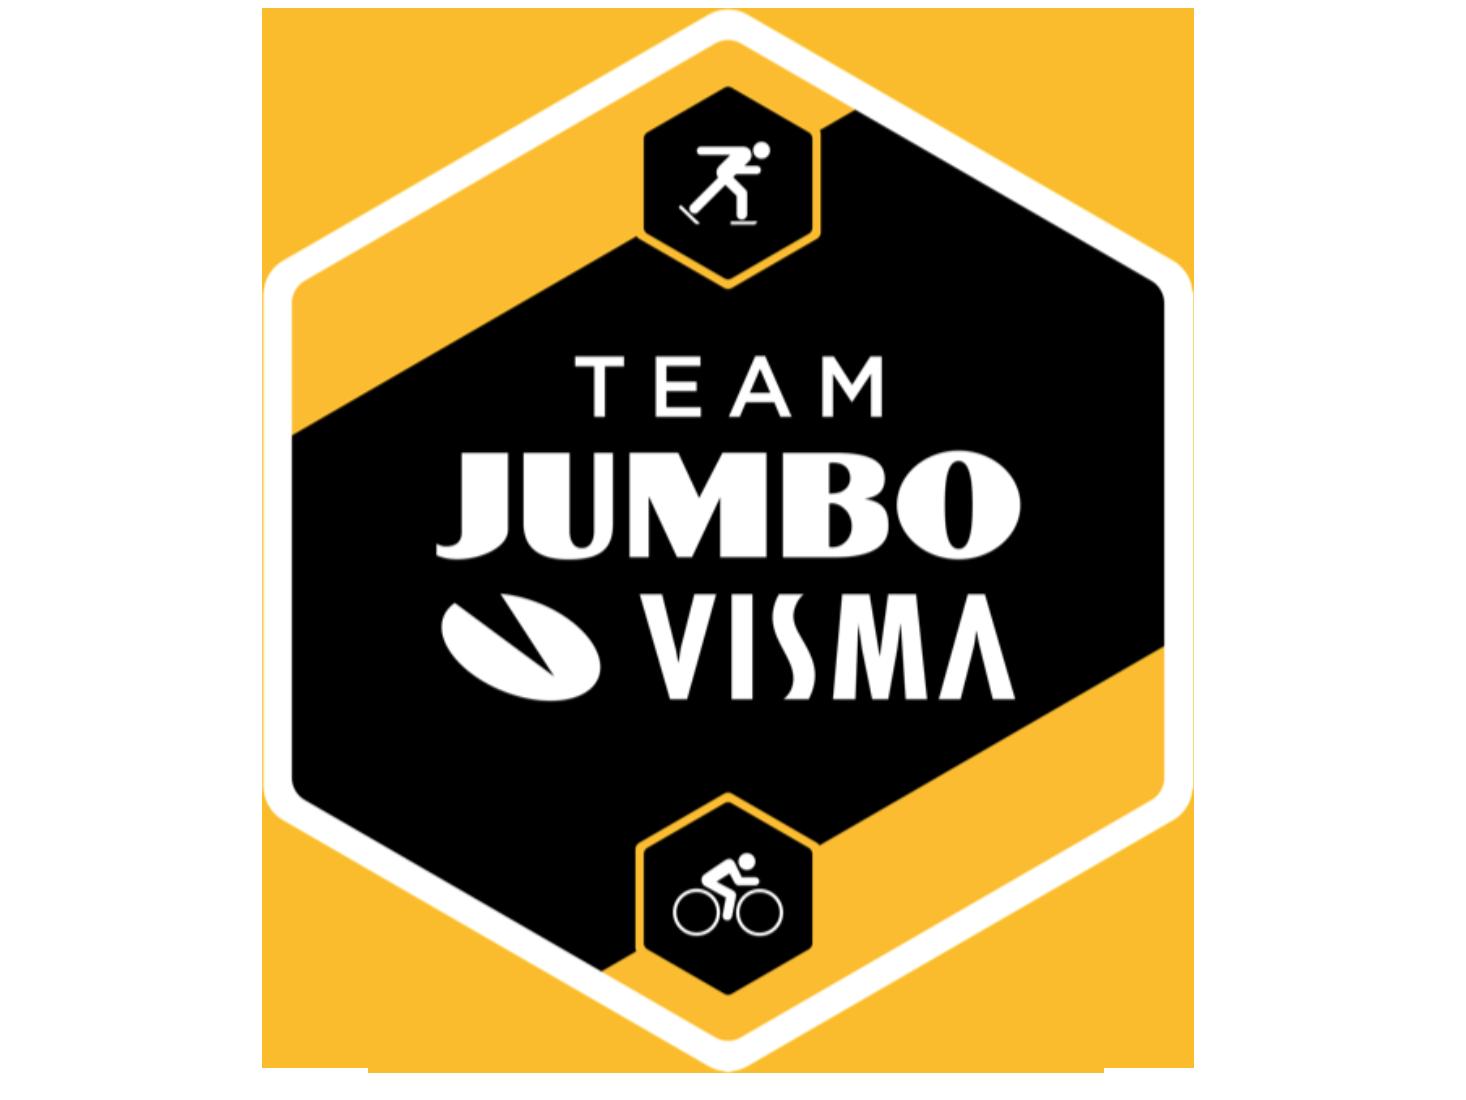 Jumbo visma logokopie3.png